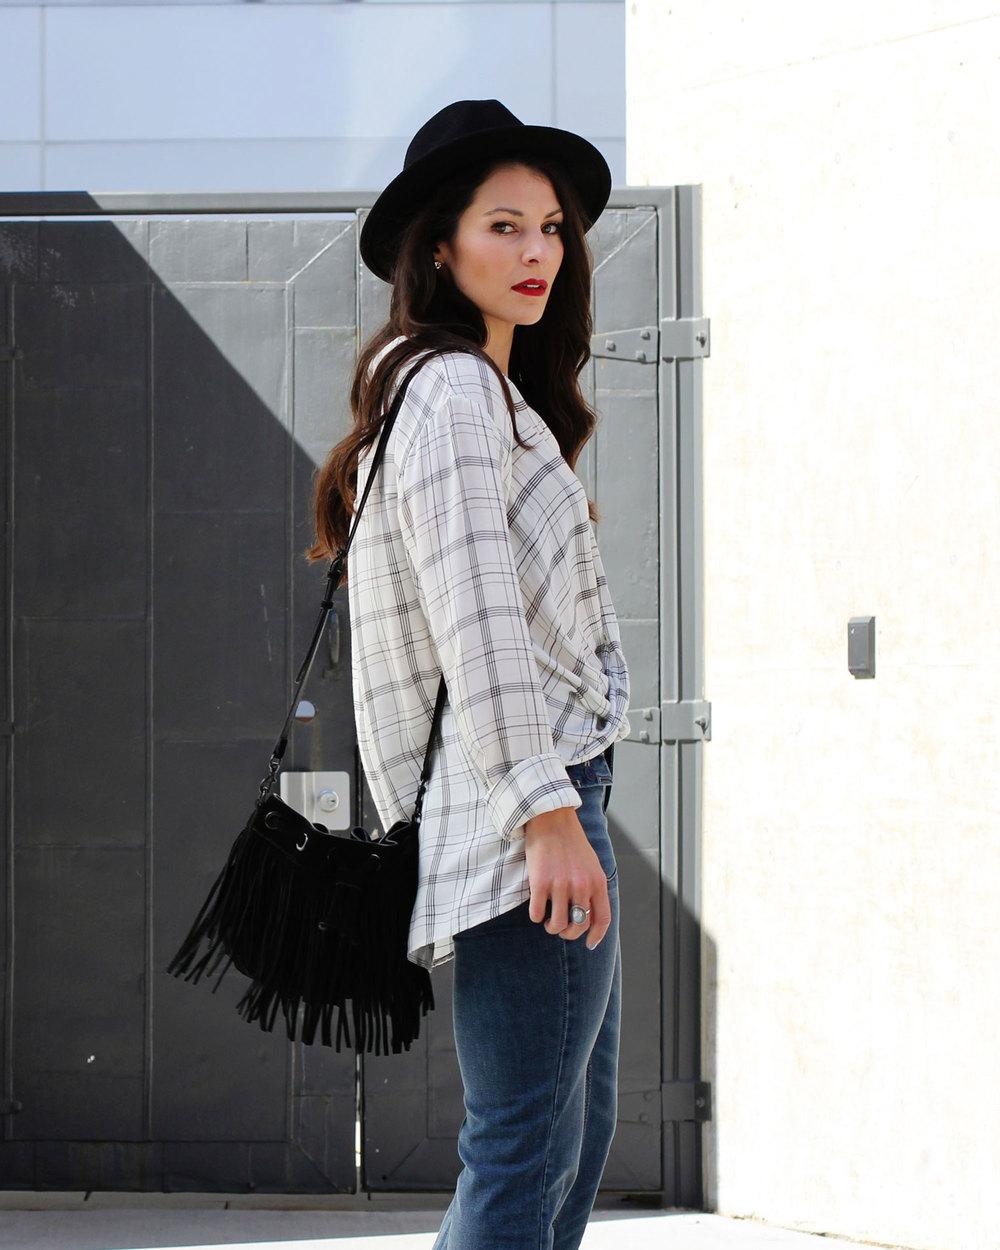 Fall Fashion, Flare Jeans, Rebecca Minkoff Fringe Bucket Bag, Abercrombie & Fitch Drapey Wrap Front Shirt, 70s Fashion Trend, NARS Lipstick Pencil in 'Cruella'